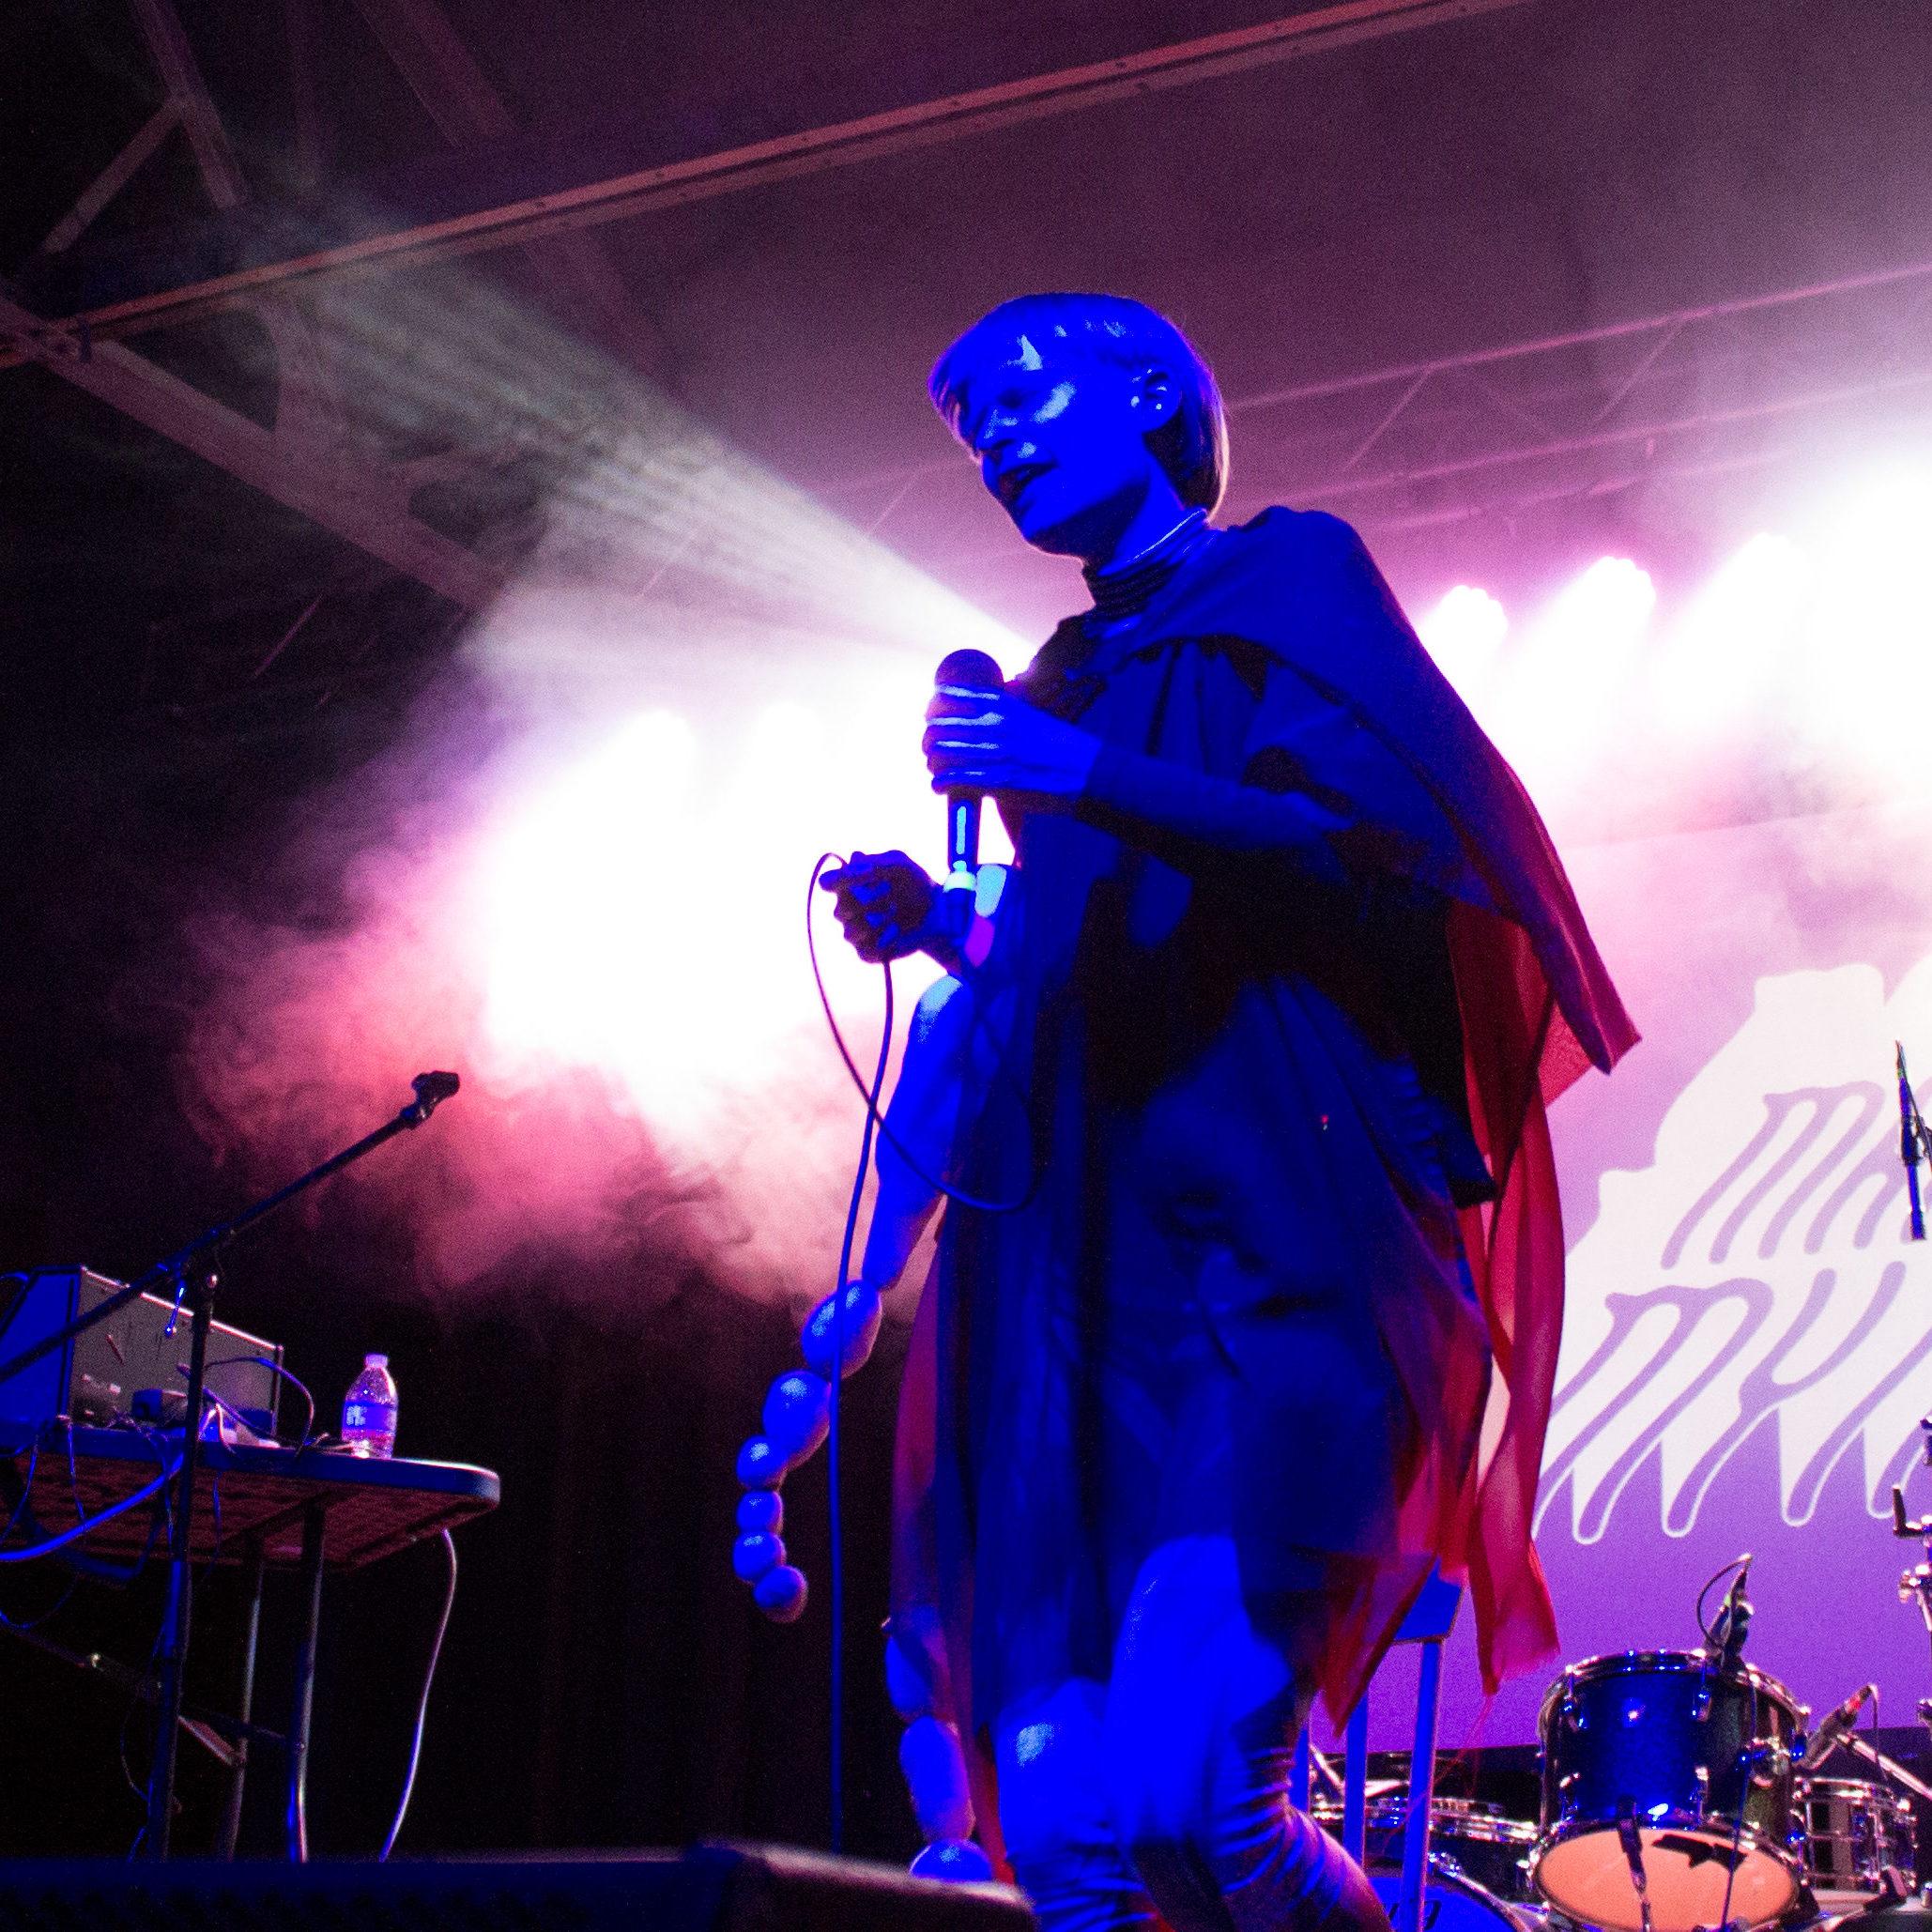 Jenny Hval @ Marfa Myths 3/11/17 - photo by Rebecca Dharamraj